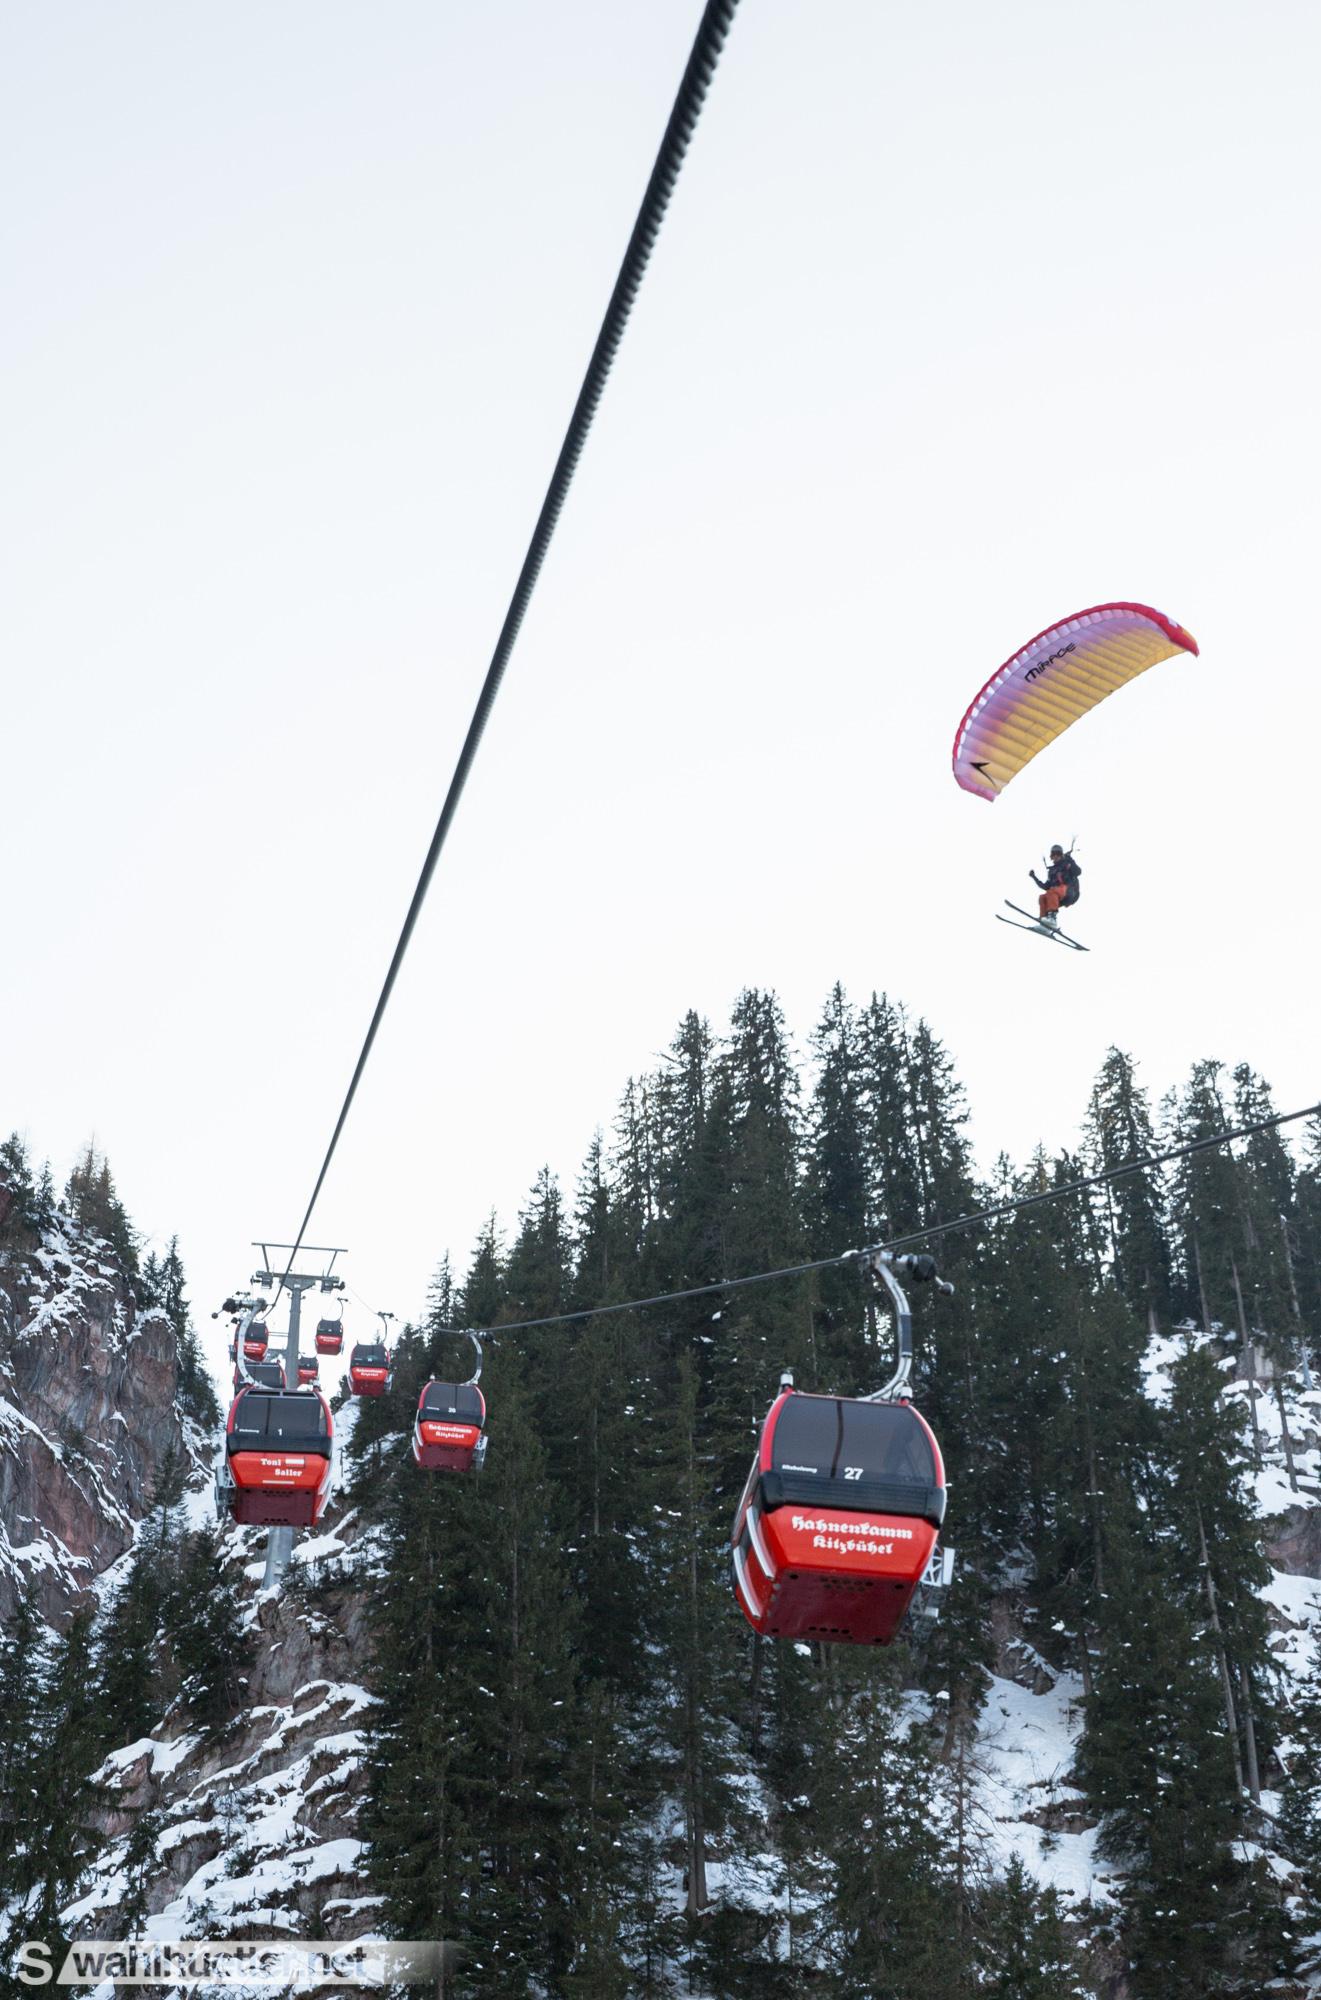 Kitzbuhel-Speedflying-Wahlhuetter-2953